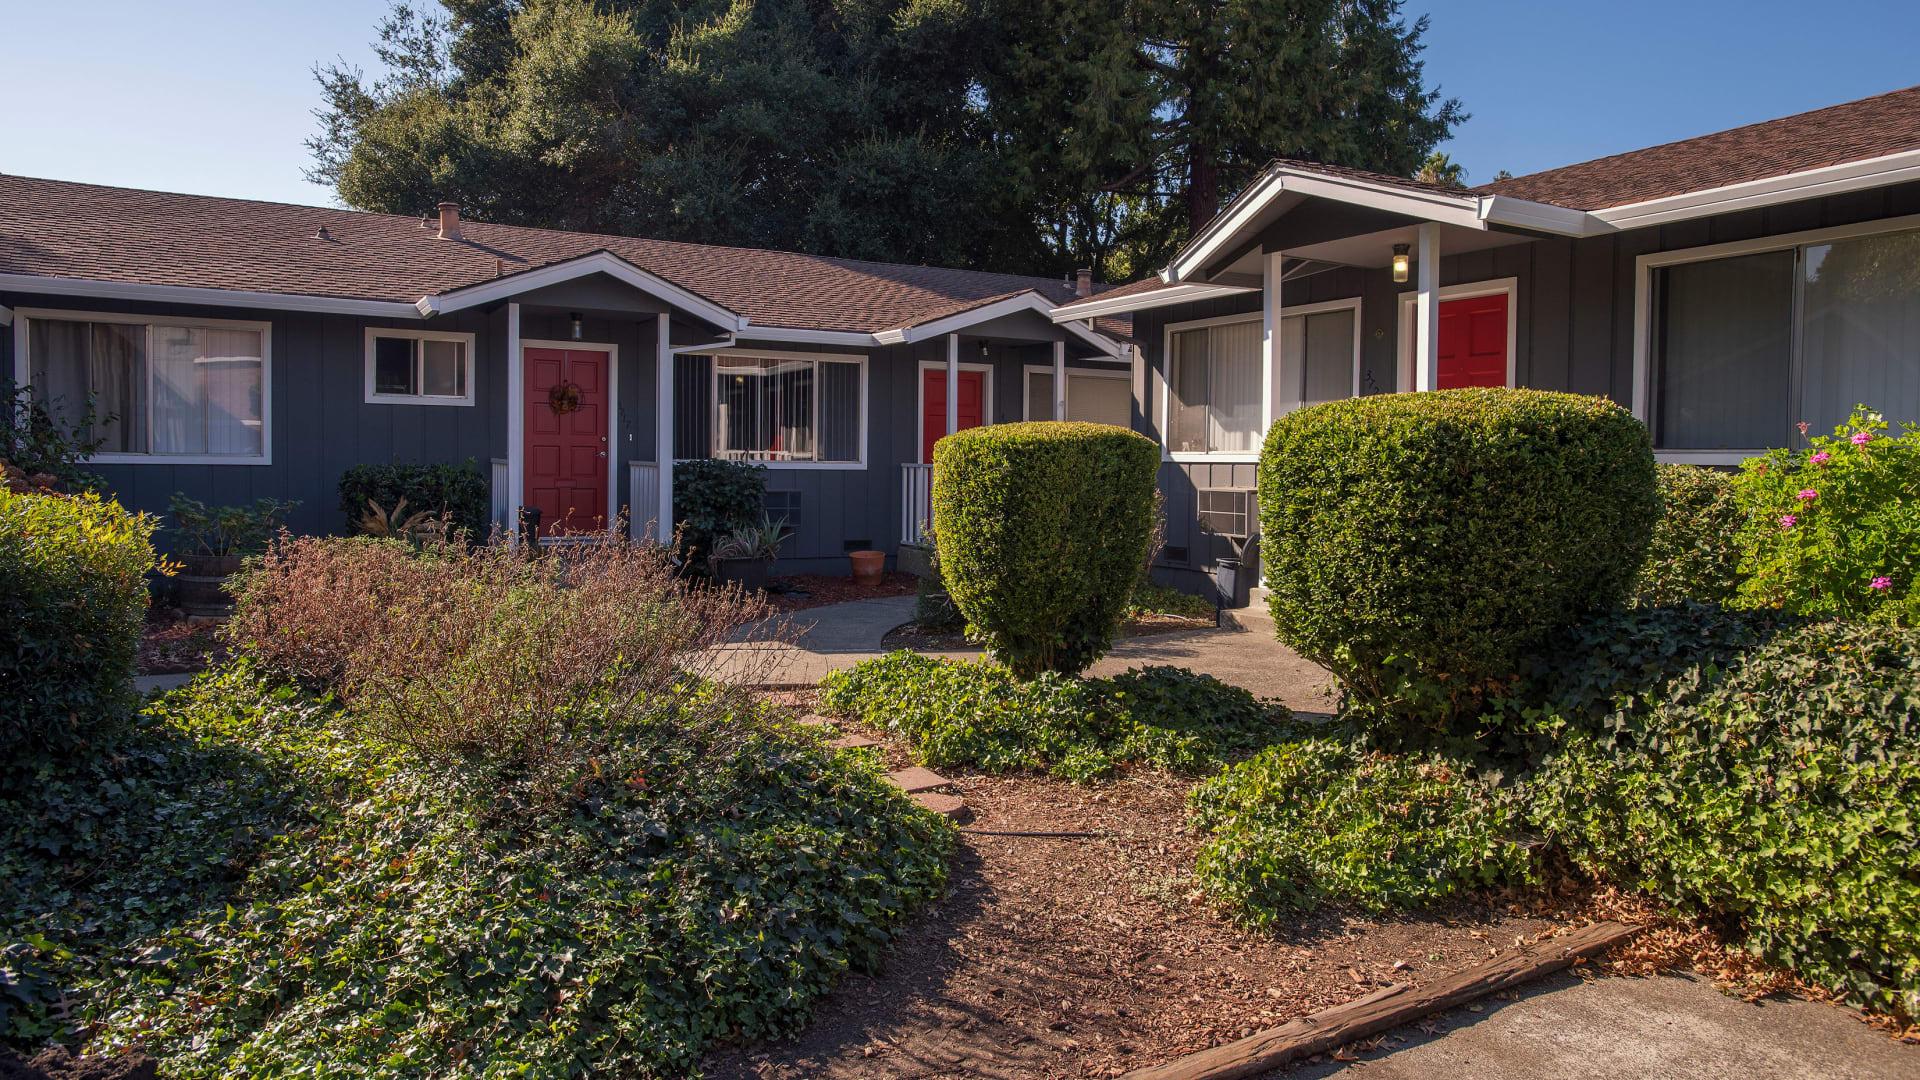 Wonderful landscaping at Spring Lake Apartment Homes in Santa Rosa, California